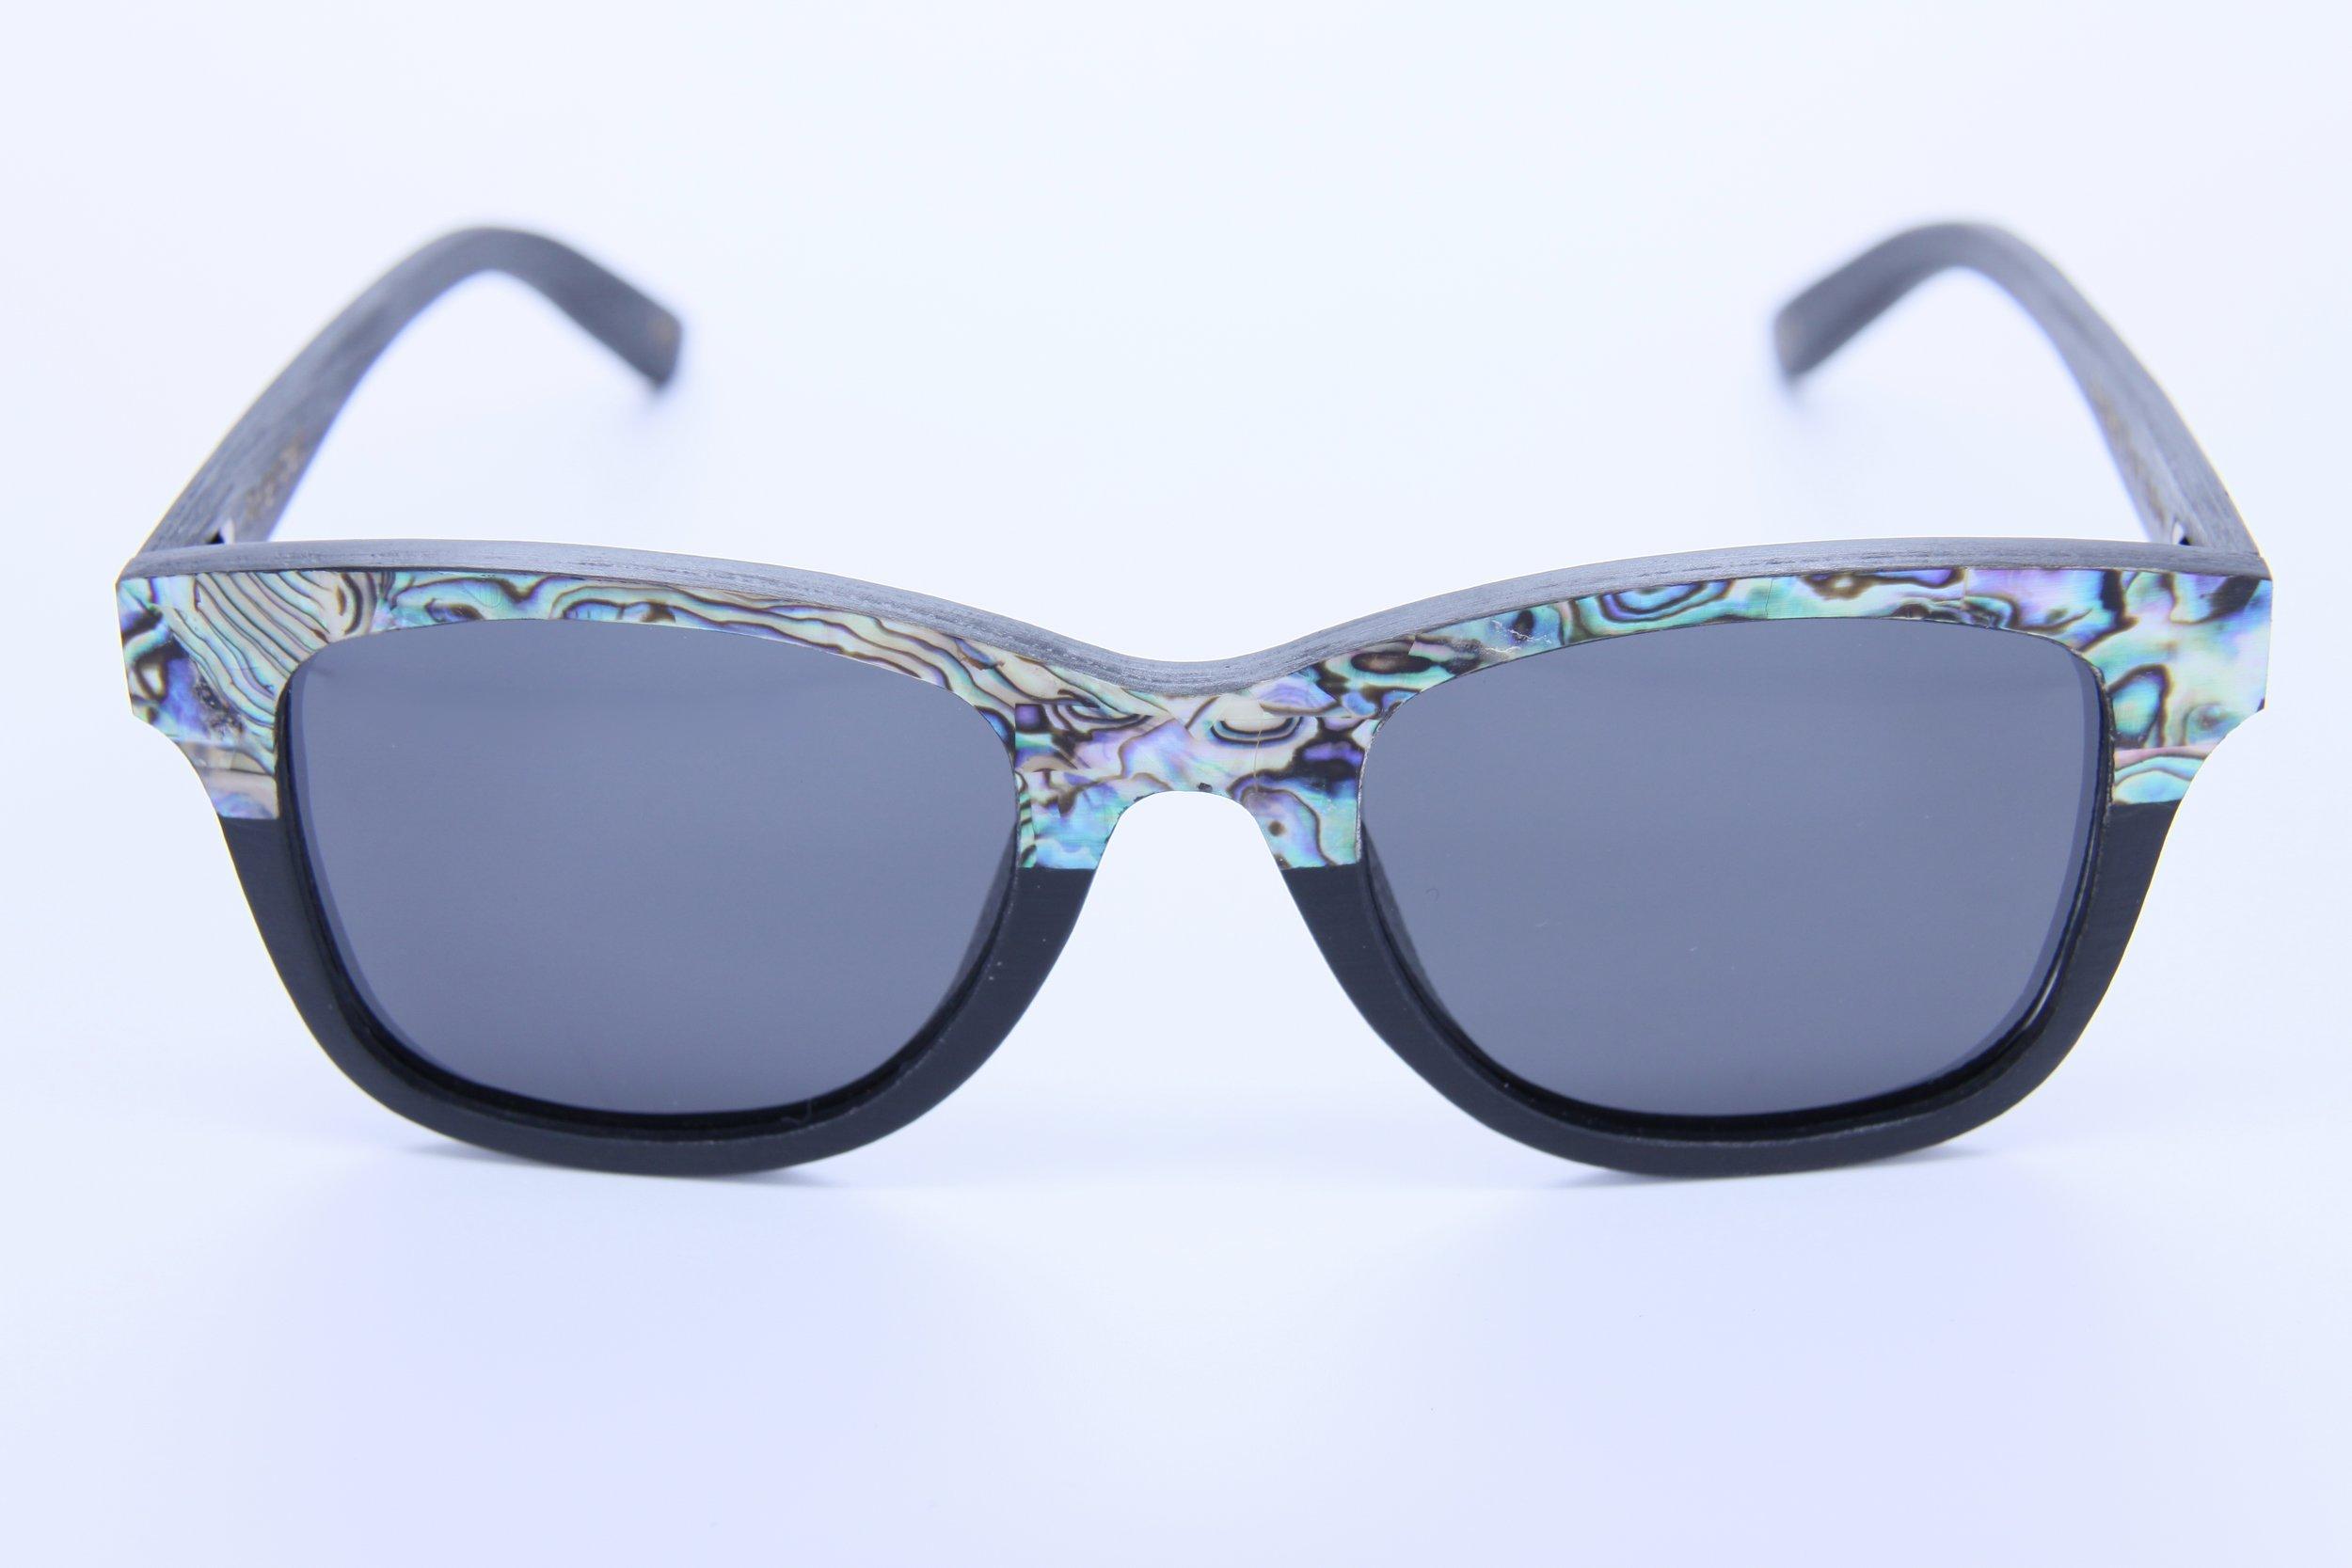 sunglasses luxury  Luxury \u0026 Eco Friendly Sunglasses \u2014 BreakWater breakwater handmade ...